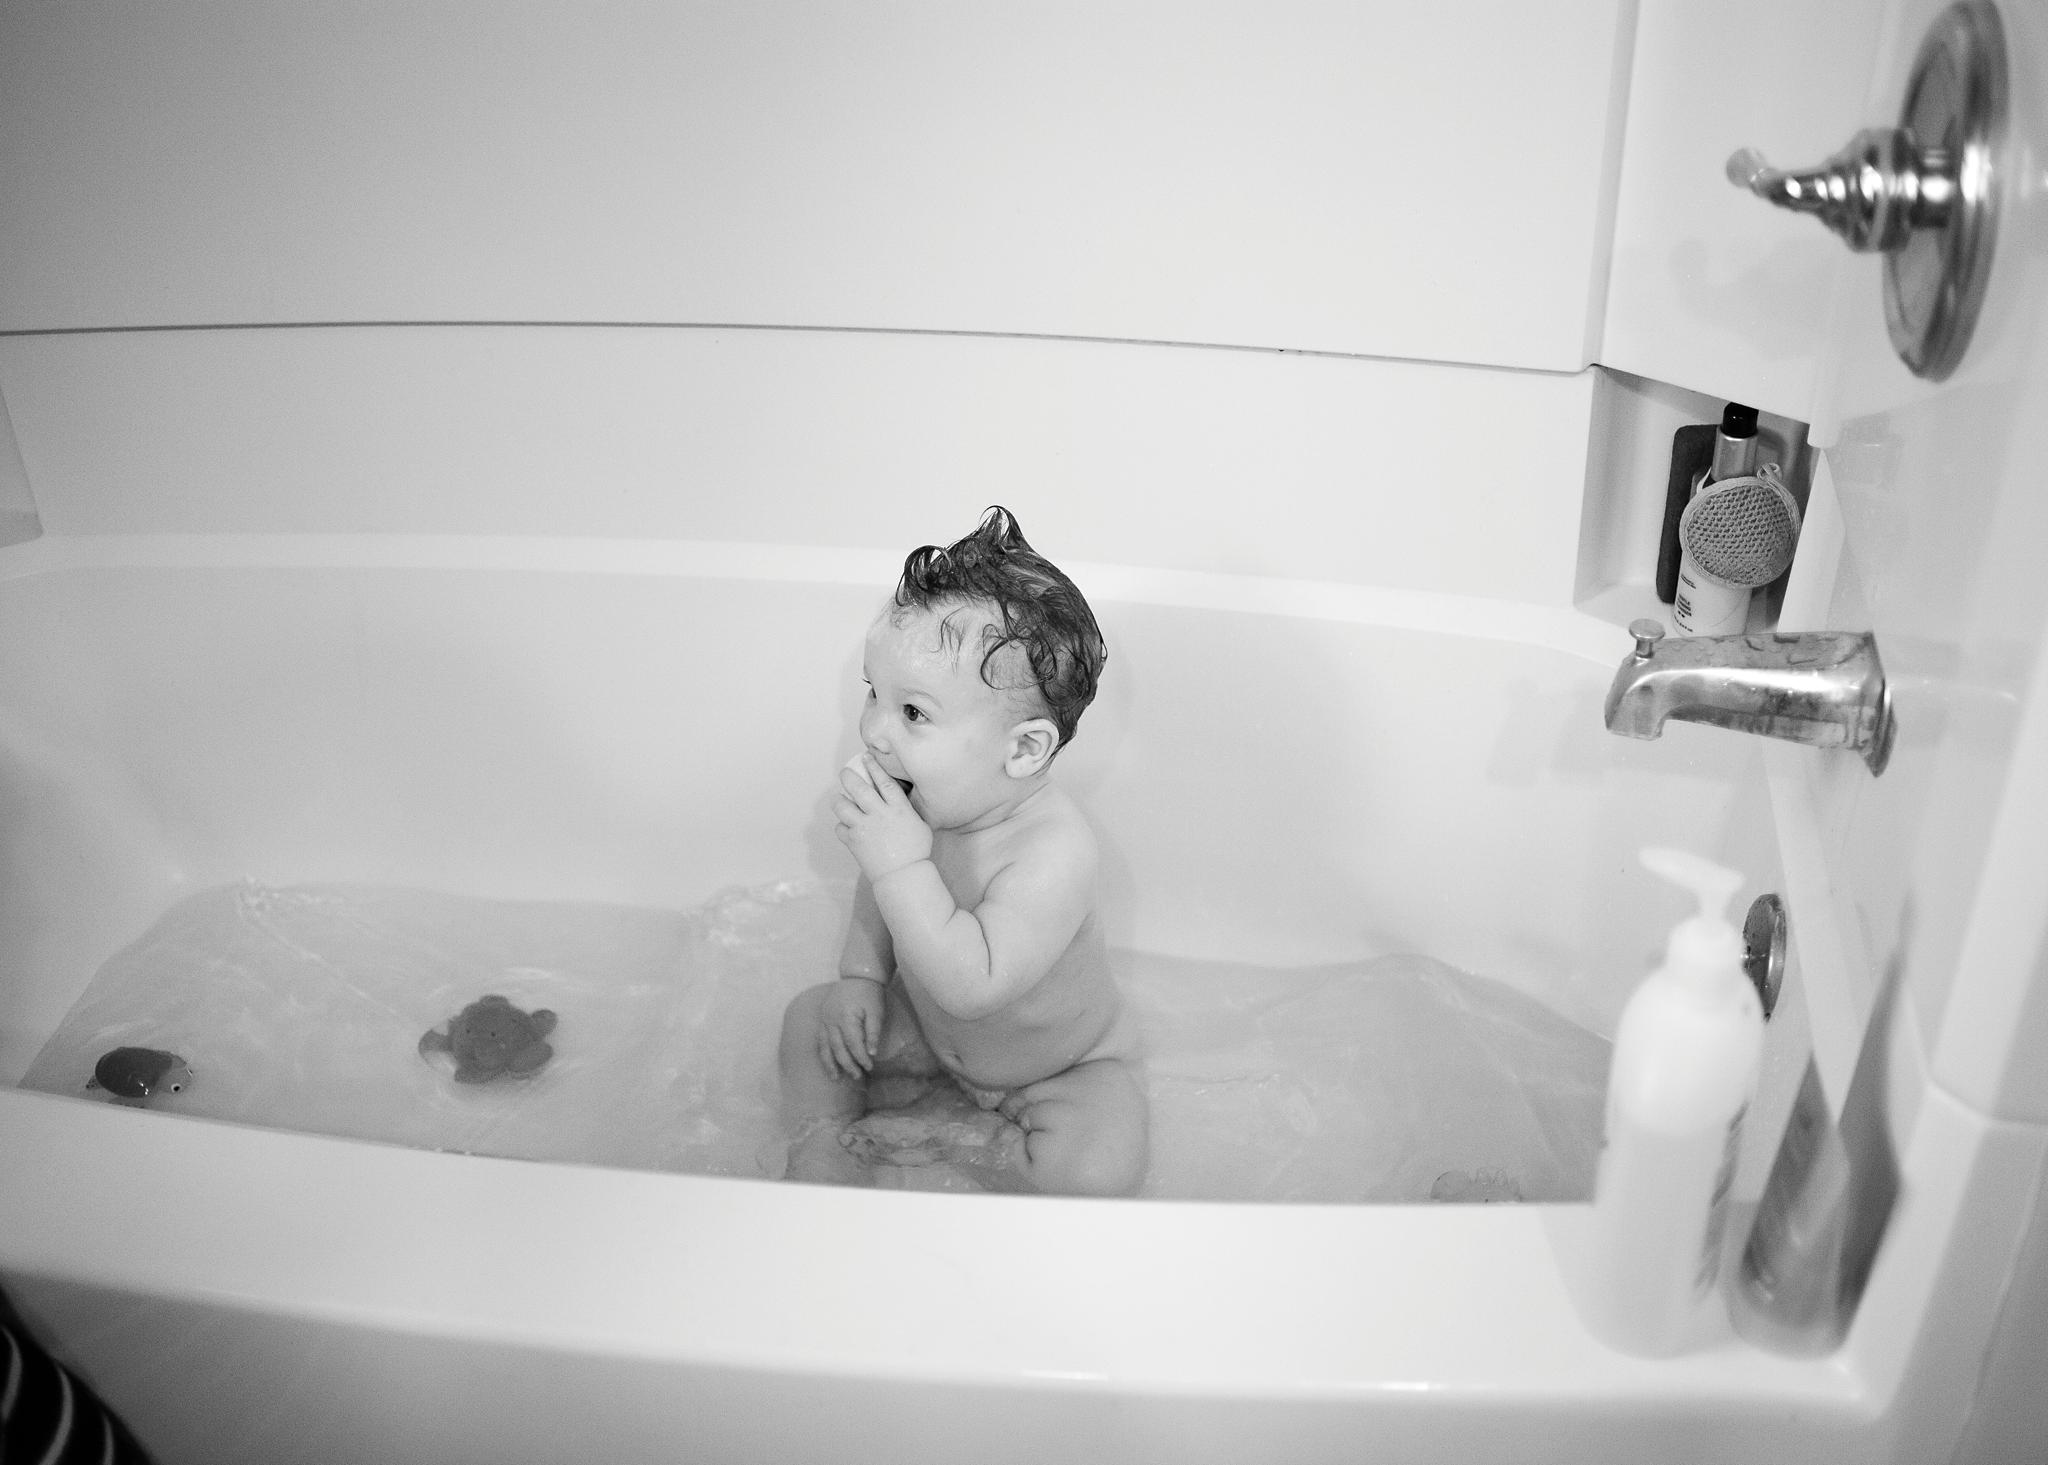 We Had Bath Time...